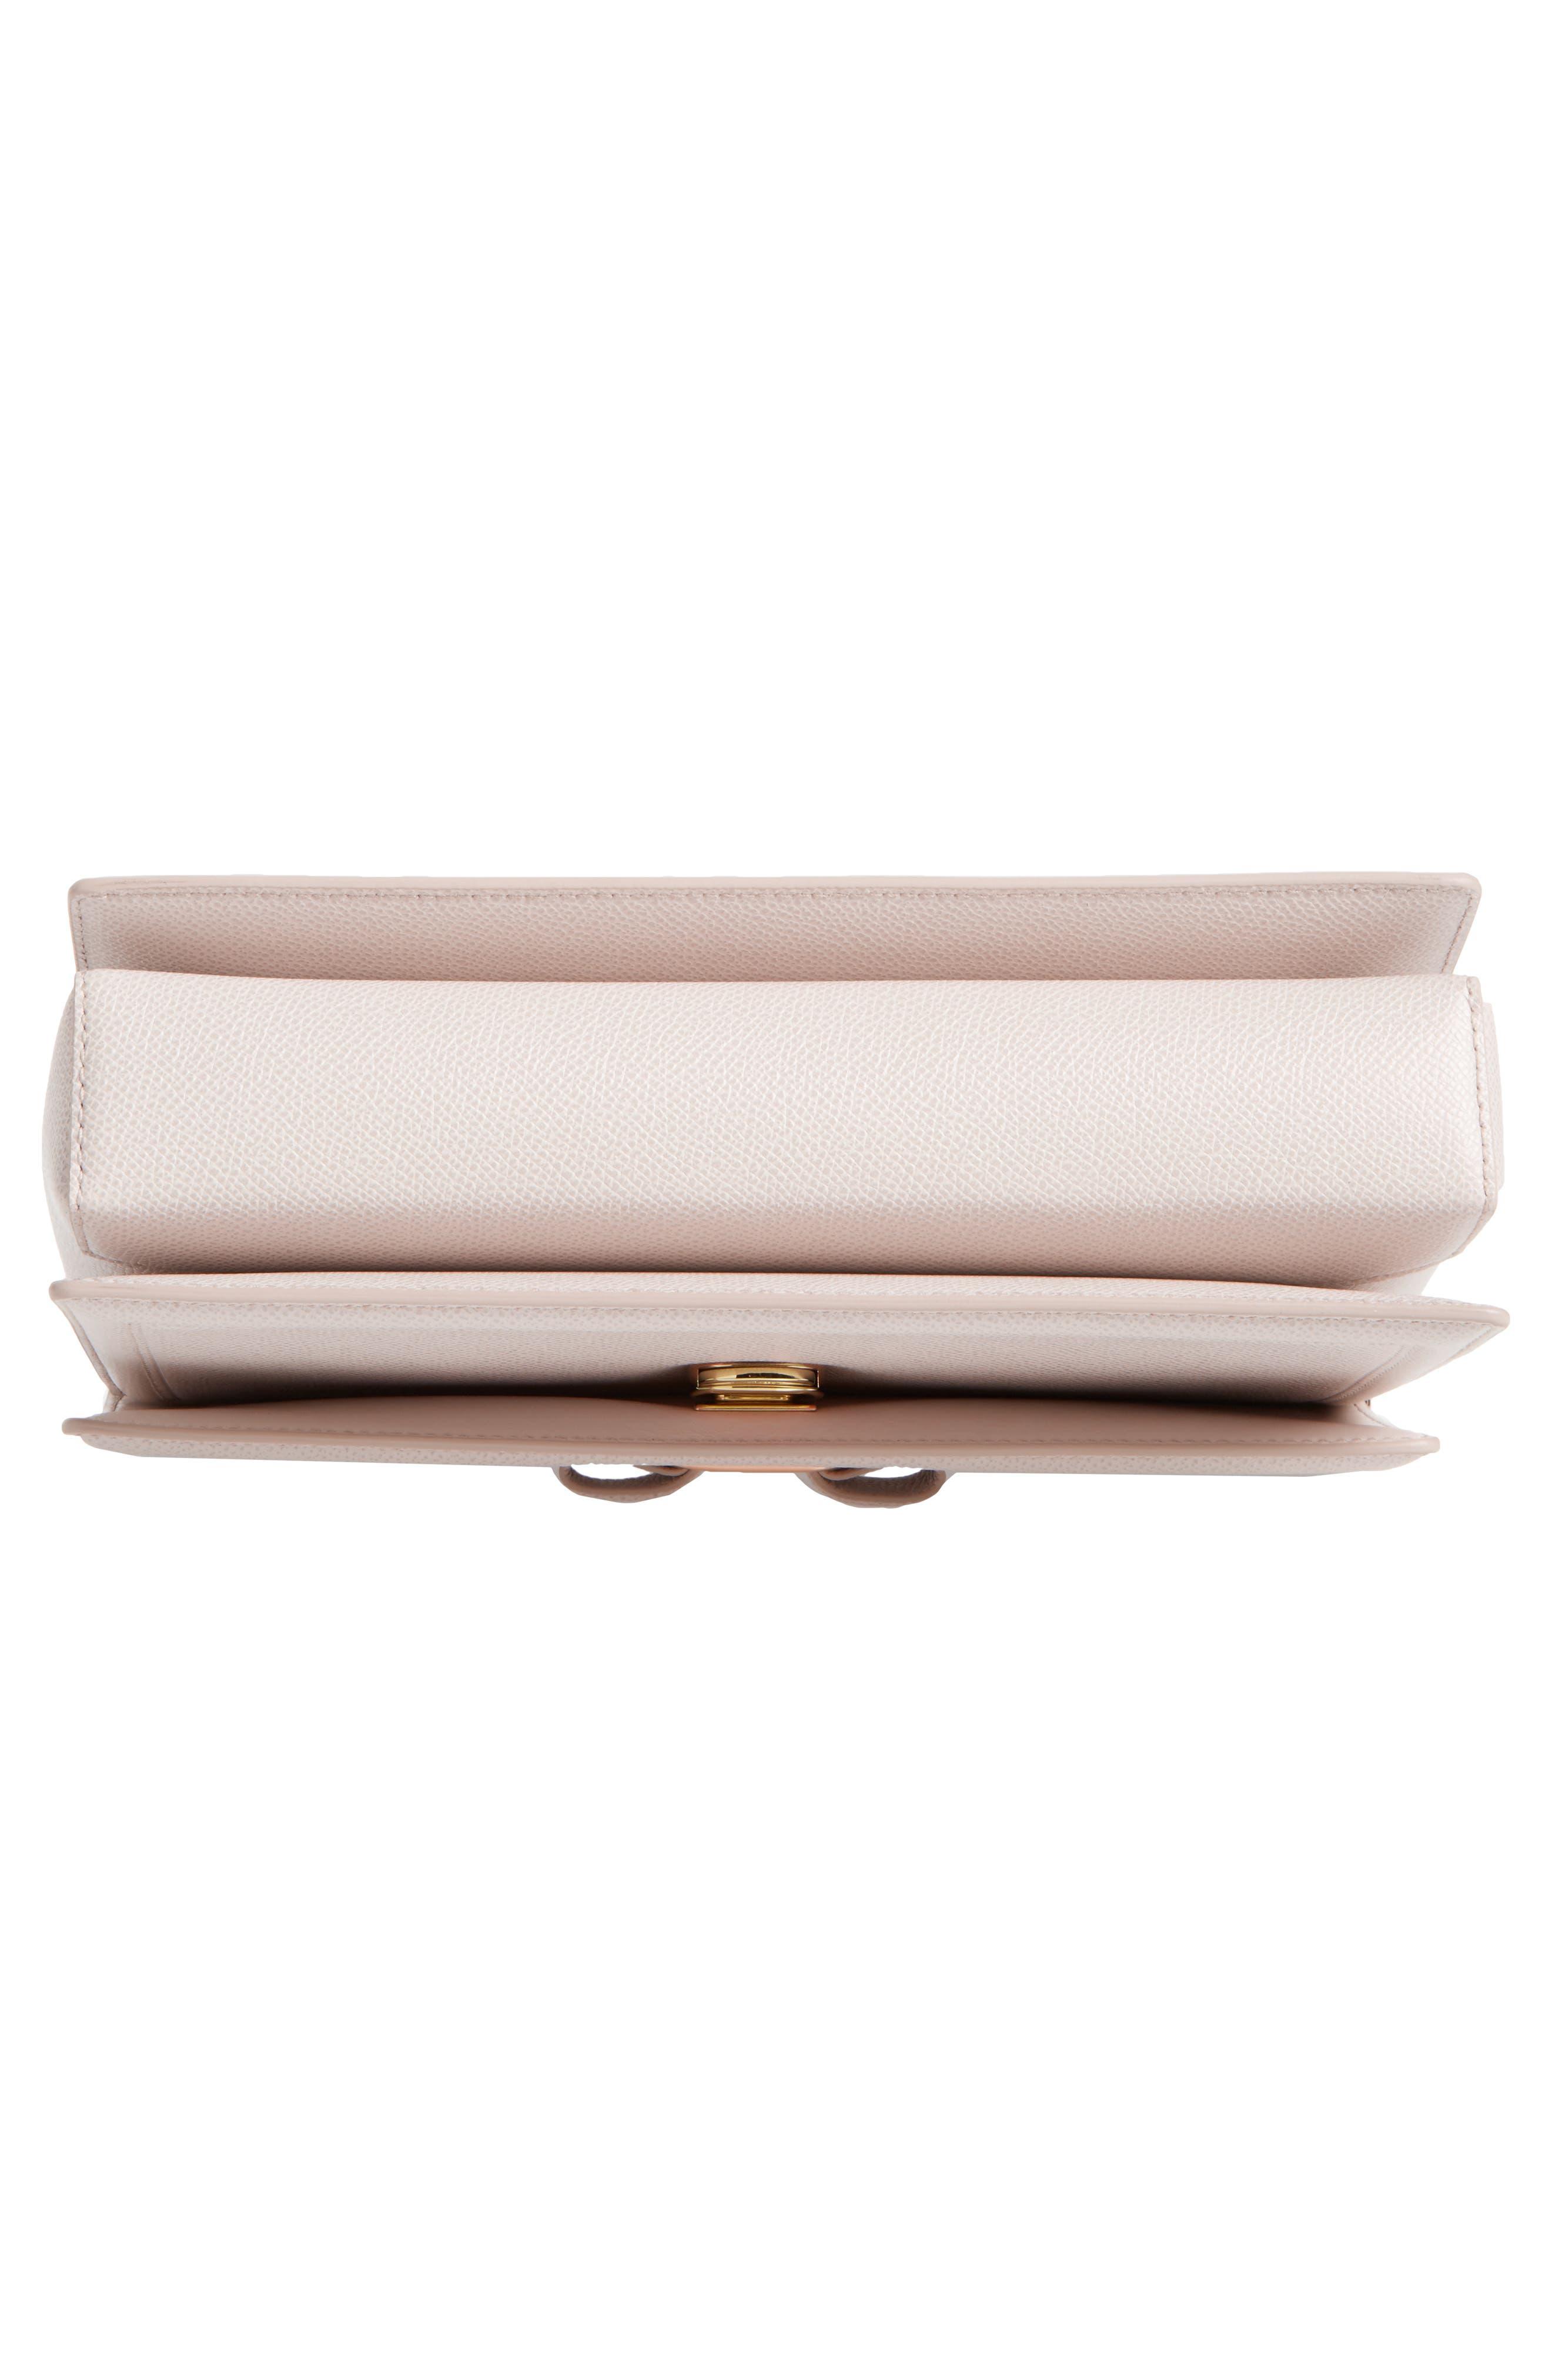 Medium Ginny Leather Shoulder Bag,                             Alternate thumbnail 6, color,                             Jasmine Flower